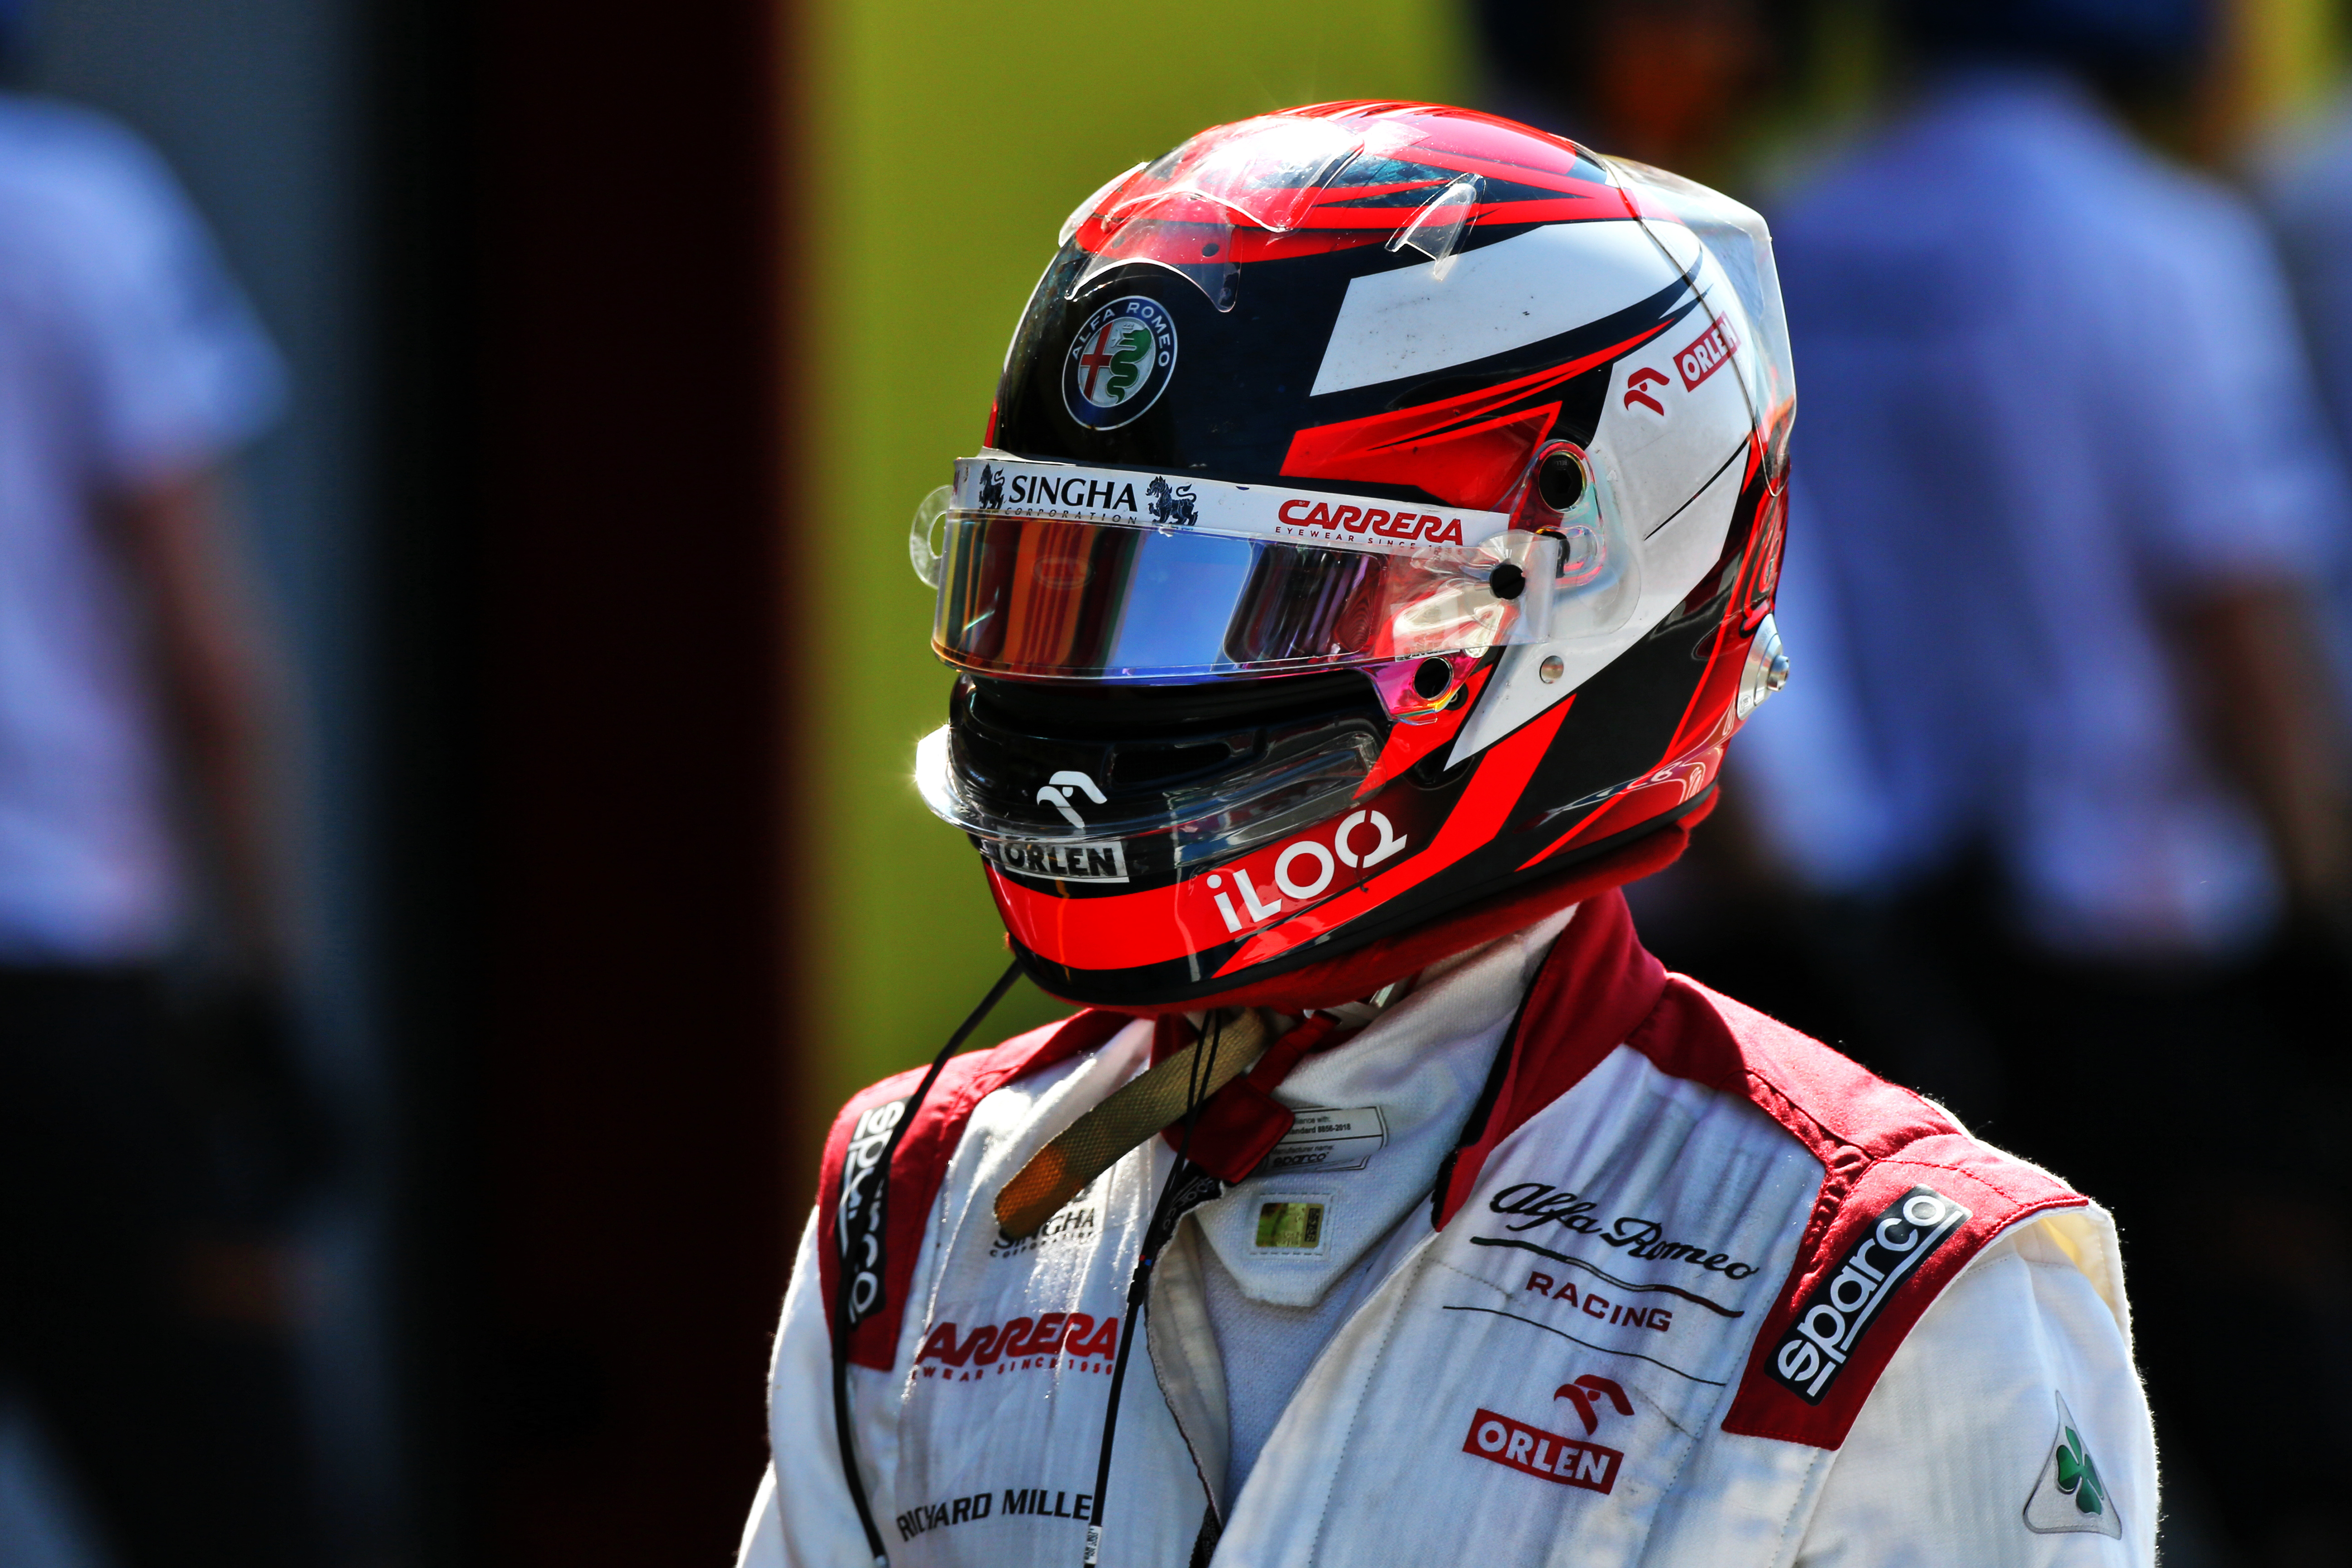 Motor Racing Formula One World Championship Tuscan Grand Prix Qualifying Day Mugello, Italy